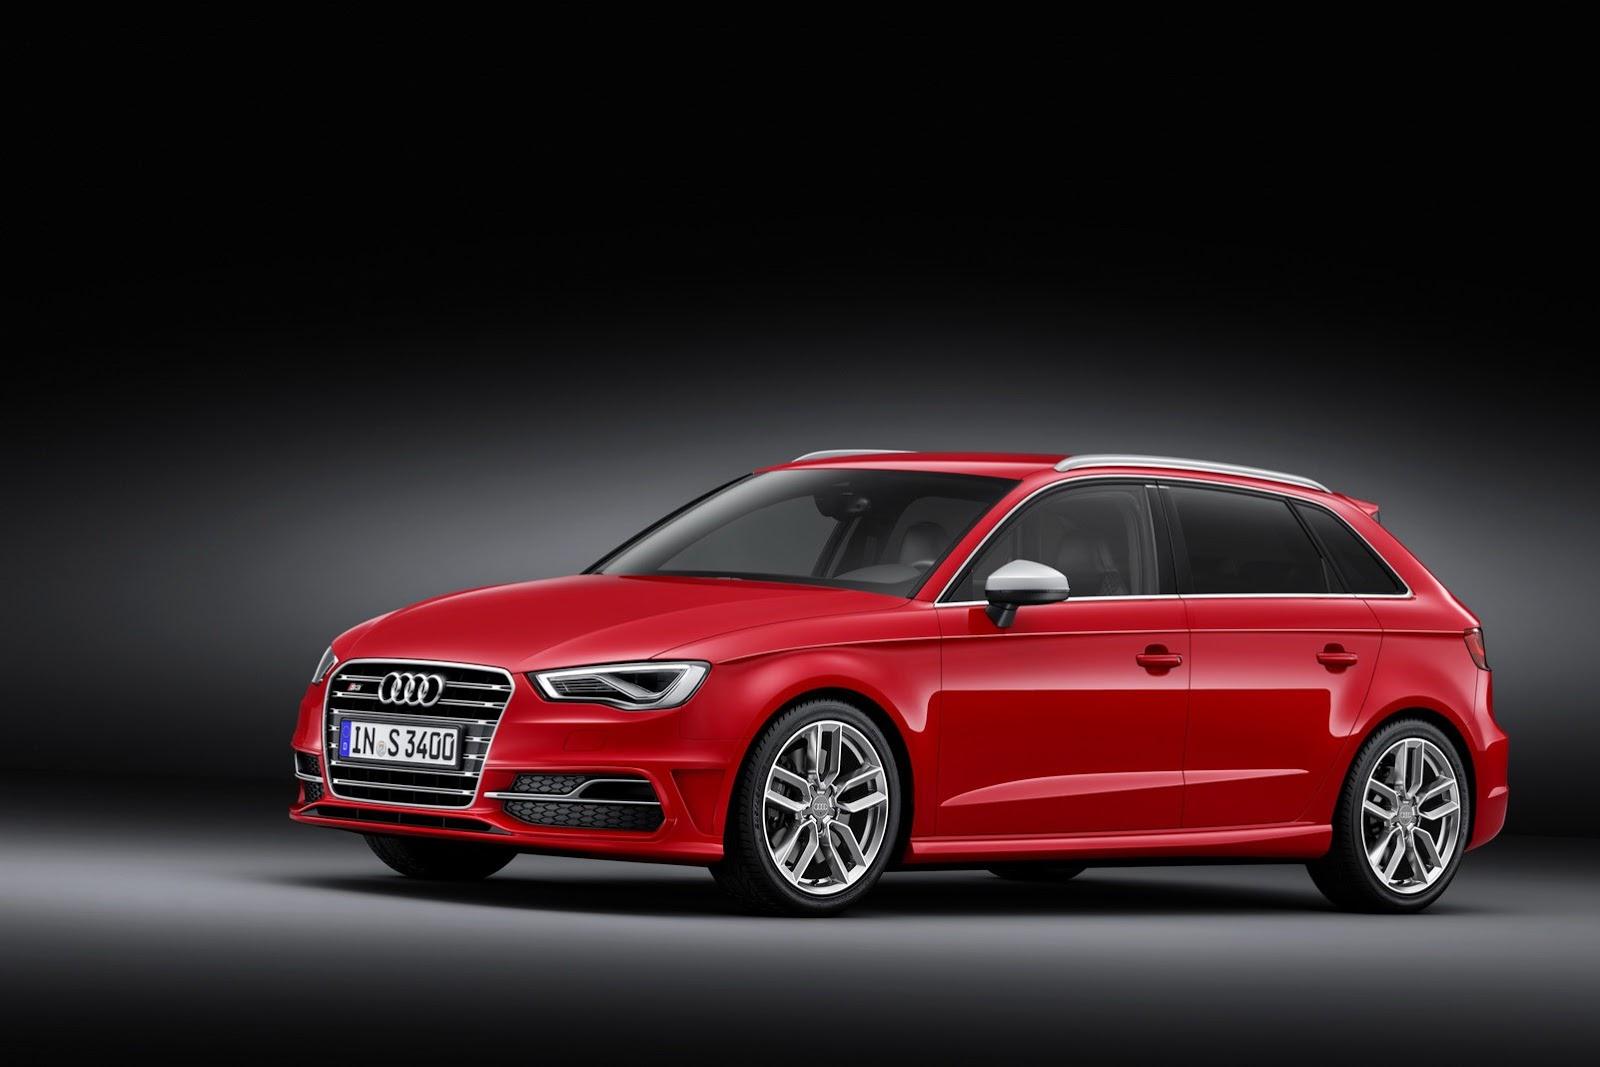 Audi-S3-Sportback-5%5B2%5D.jpg